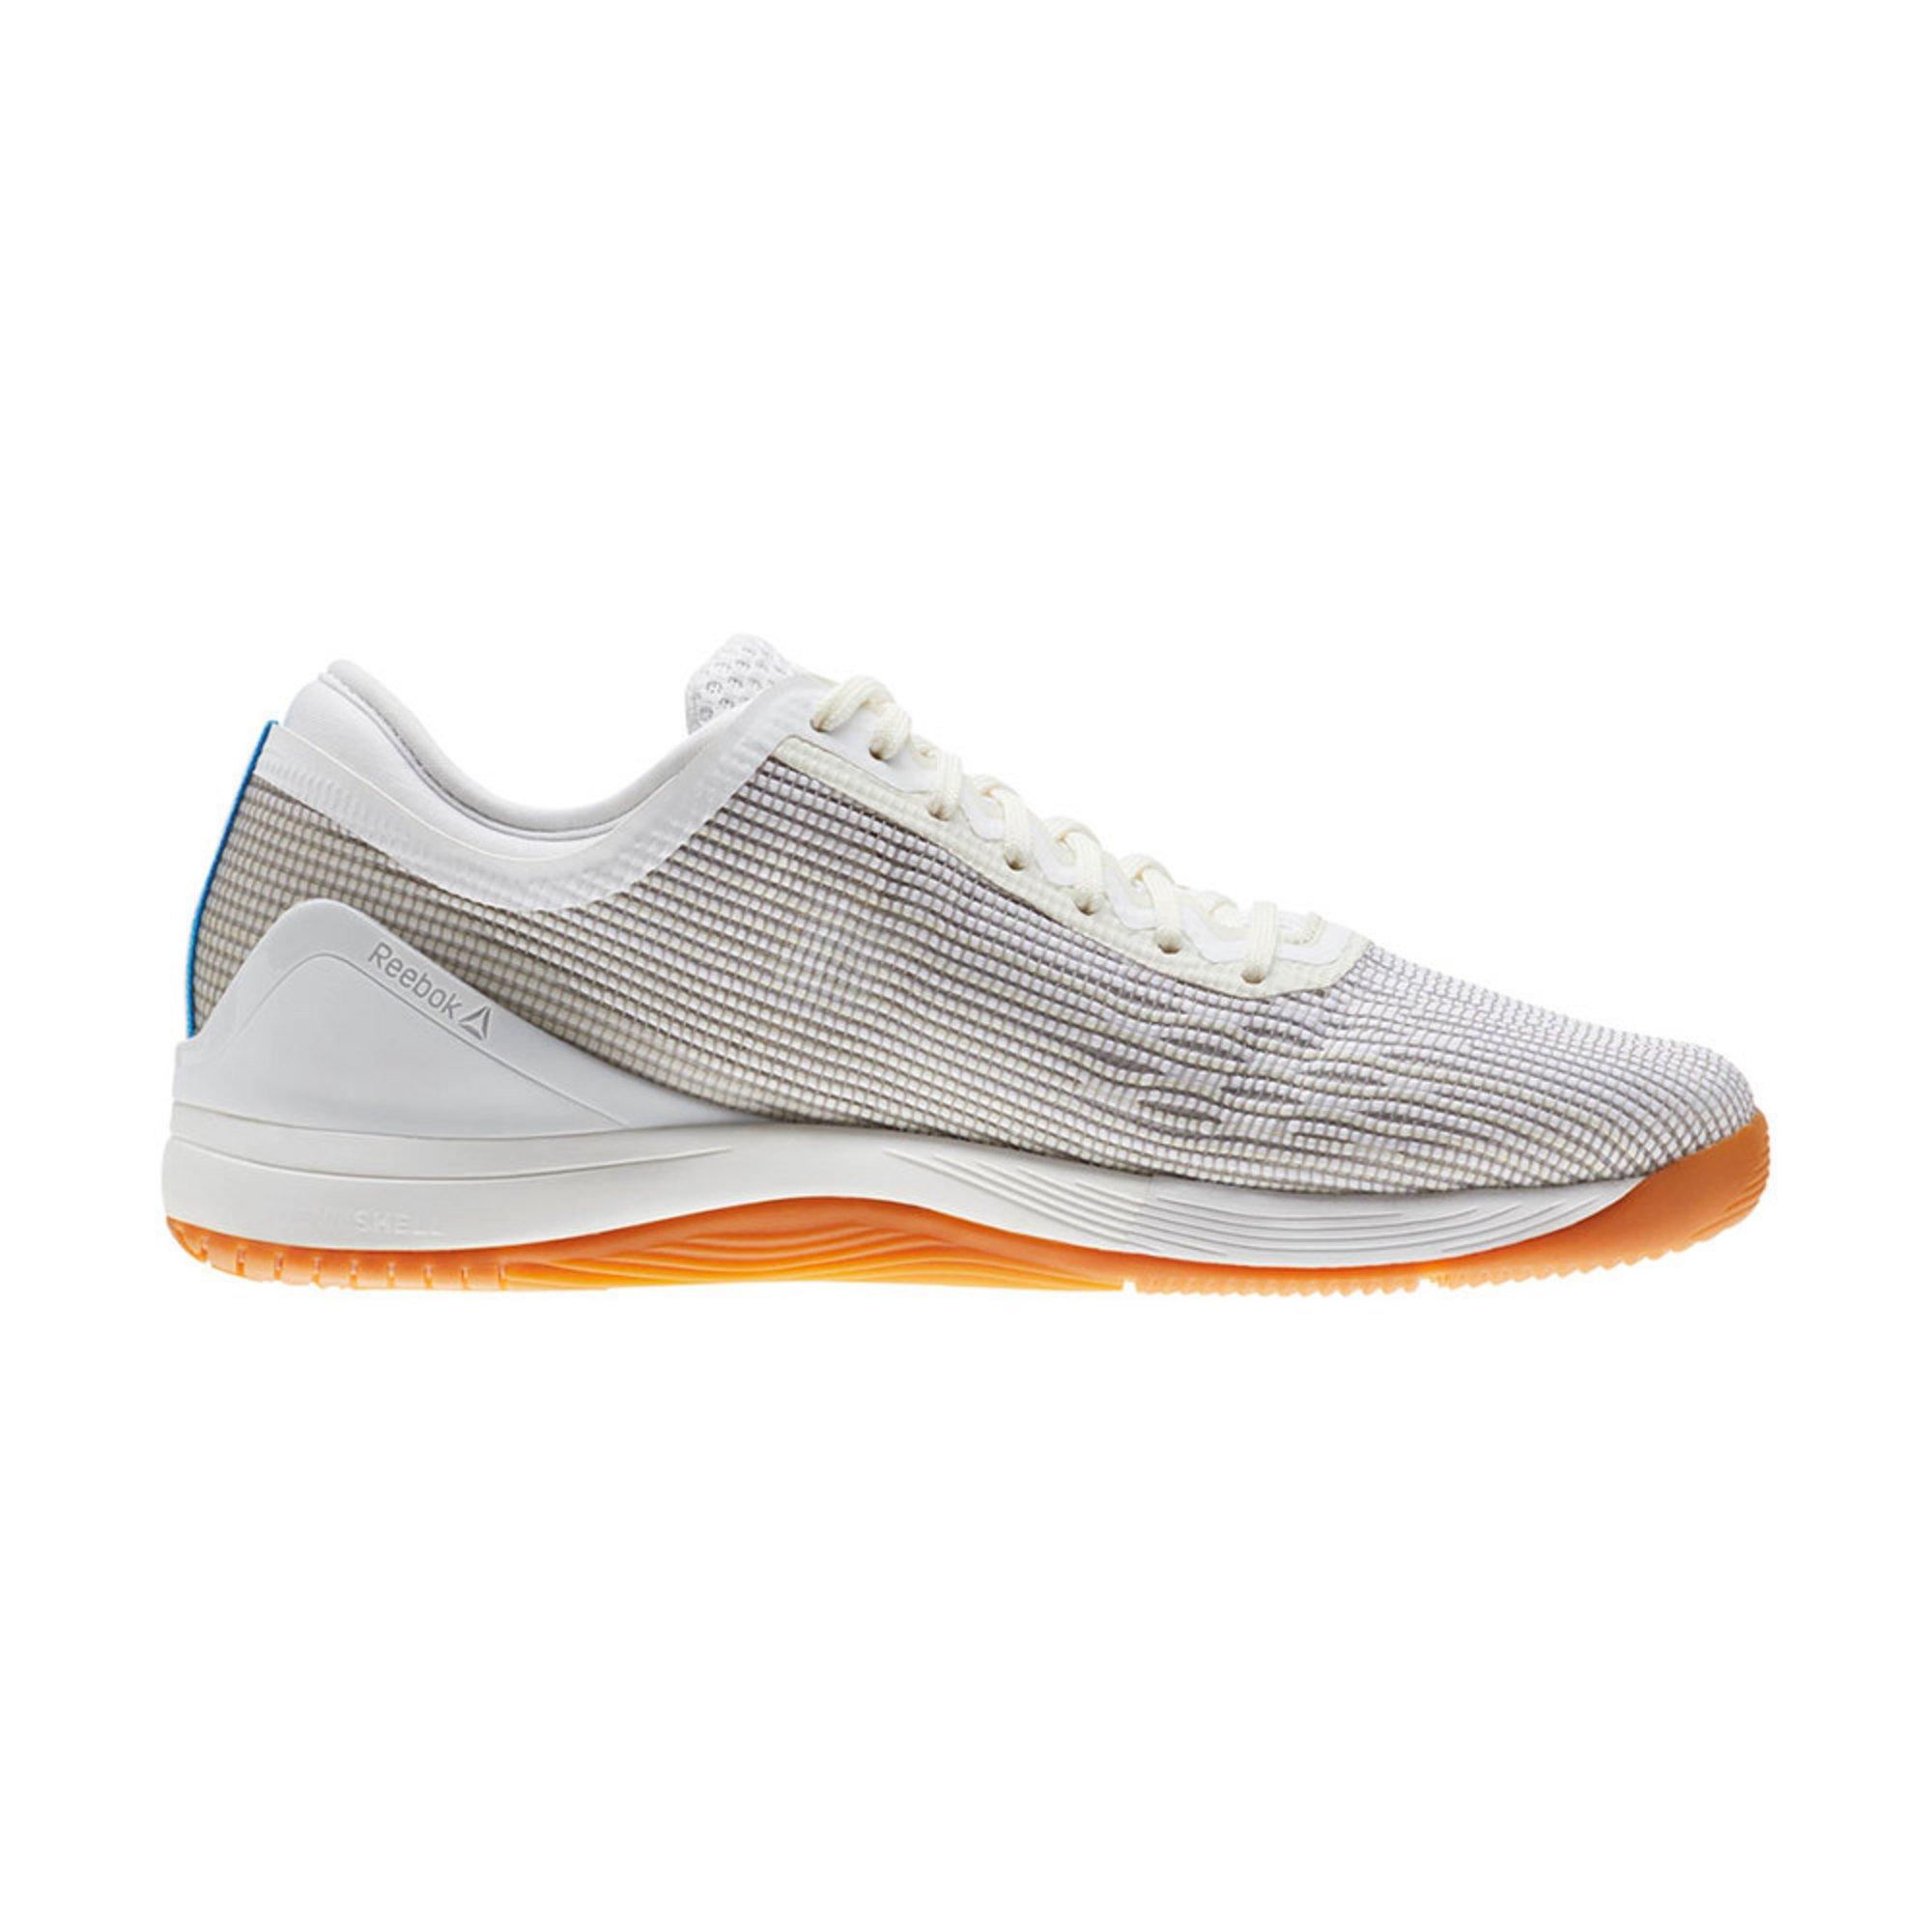 490e70ad598a Reebok. Reebok Women s Crossfit Nano 8.0 Crossfit Shoe